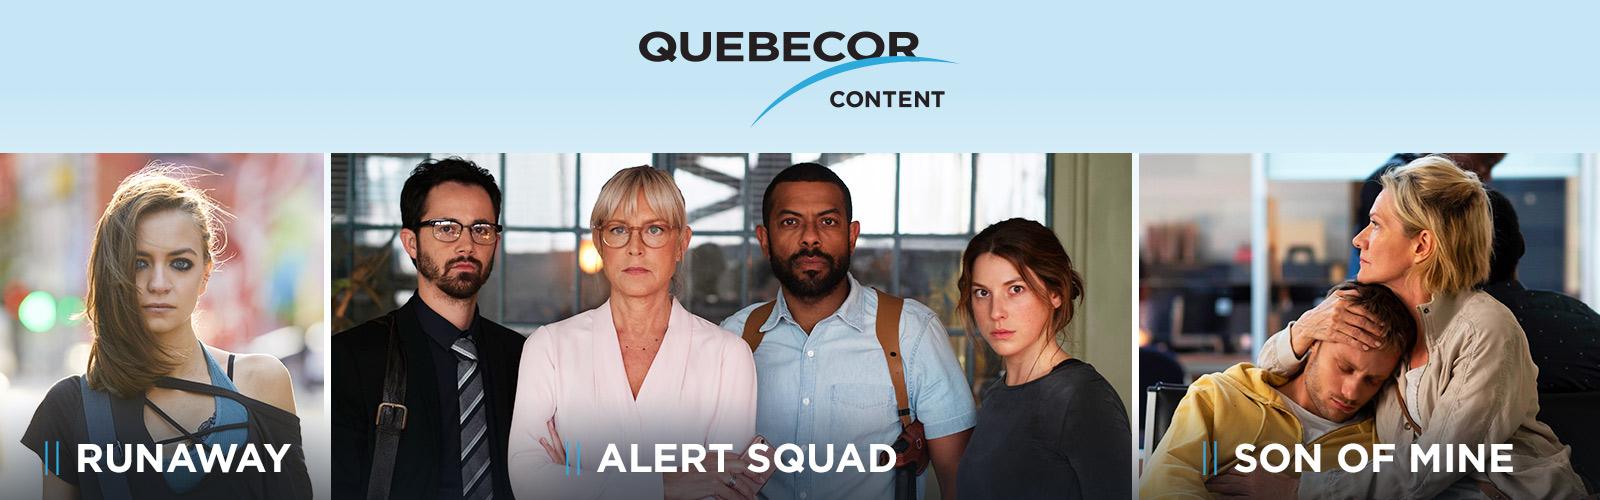 Quebecor Content